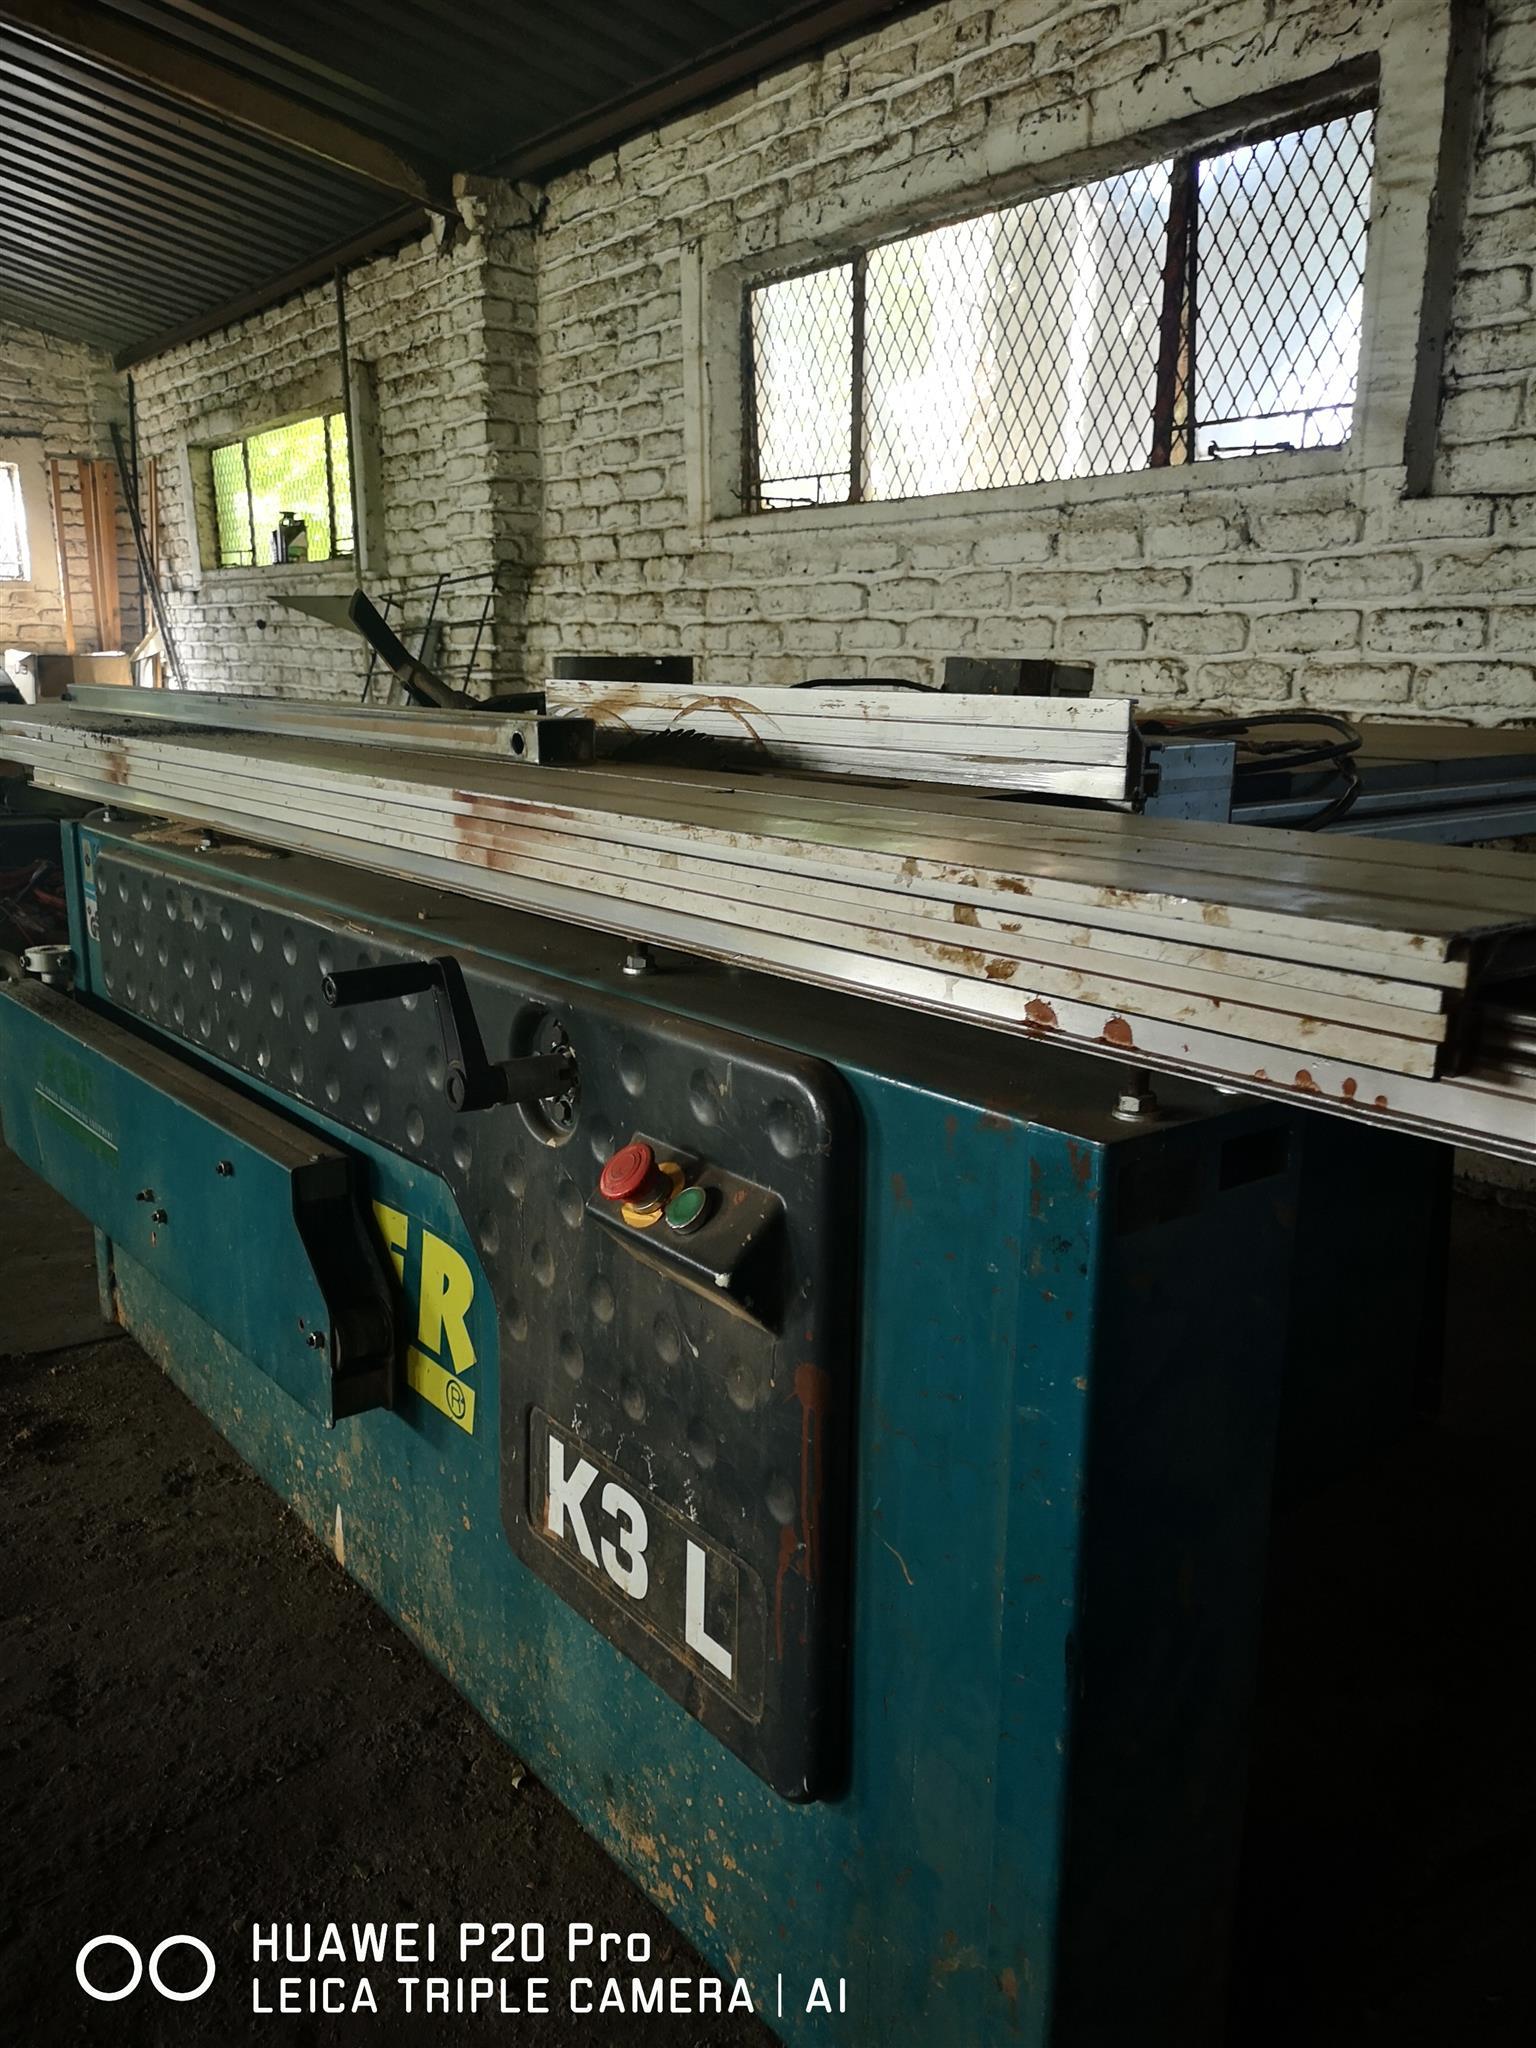 Woodworking machinary